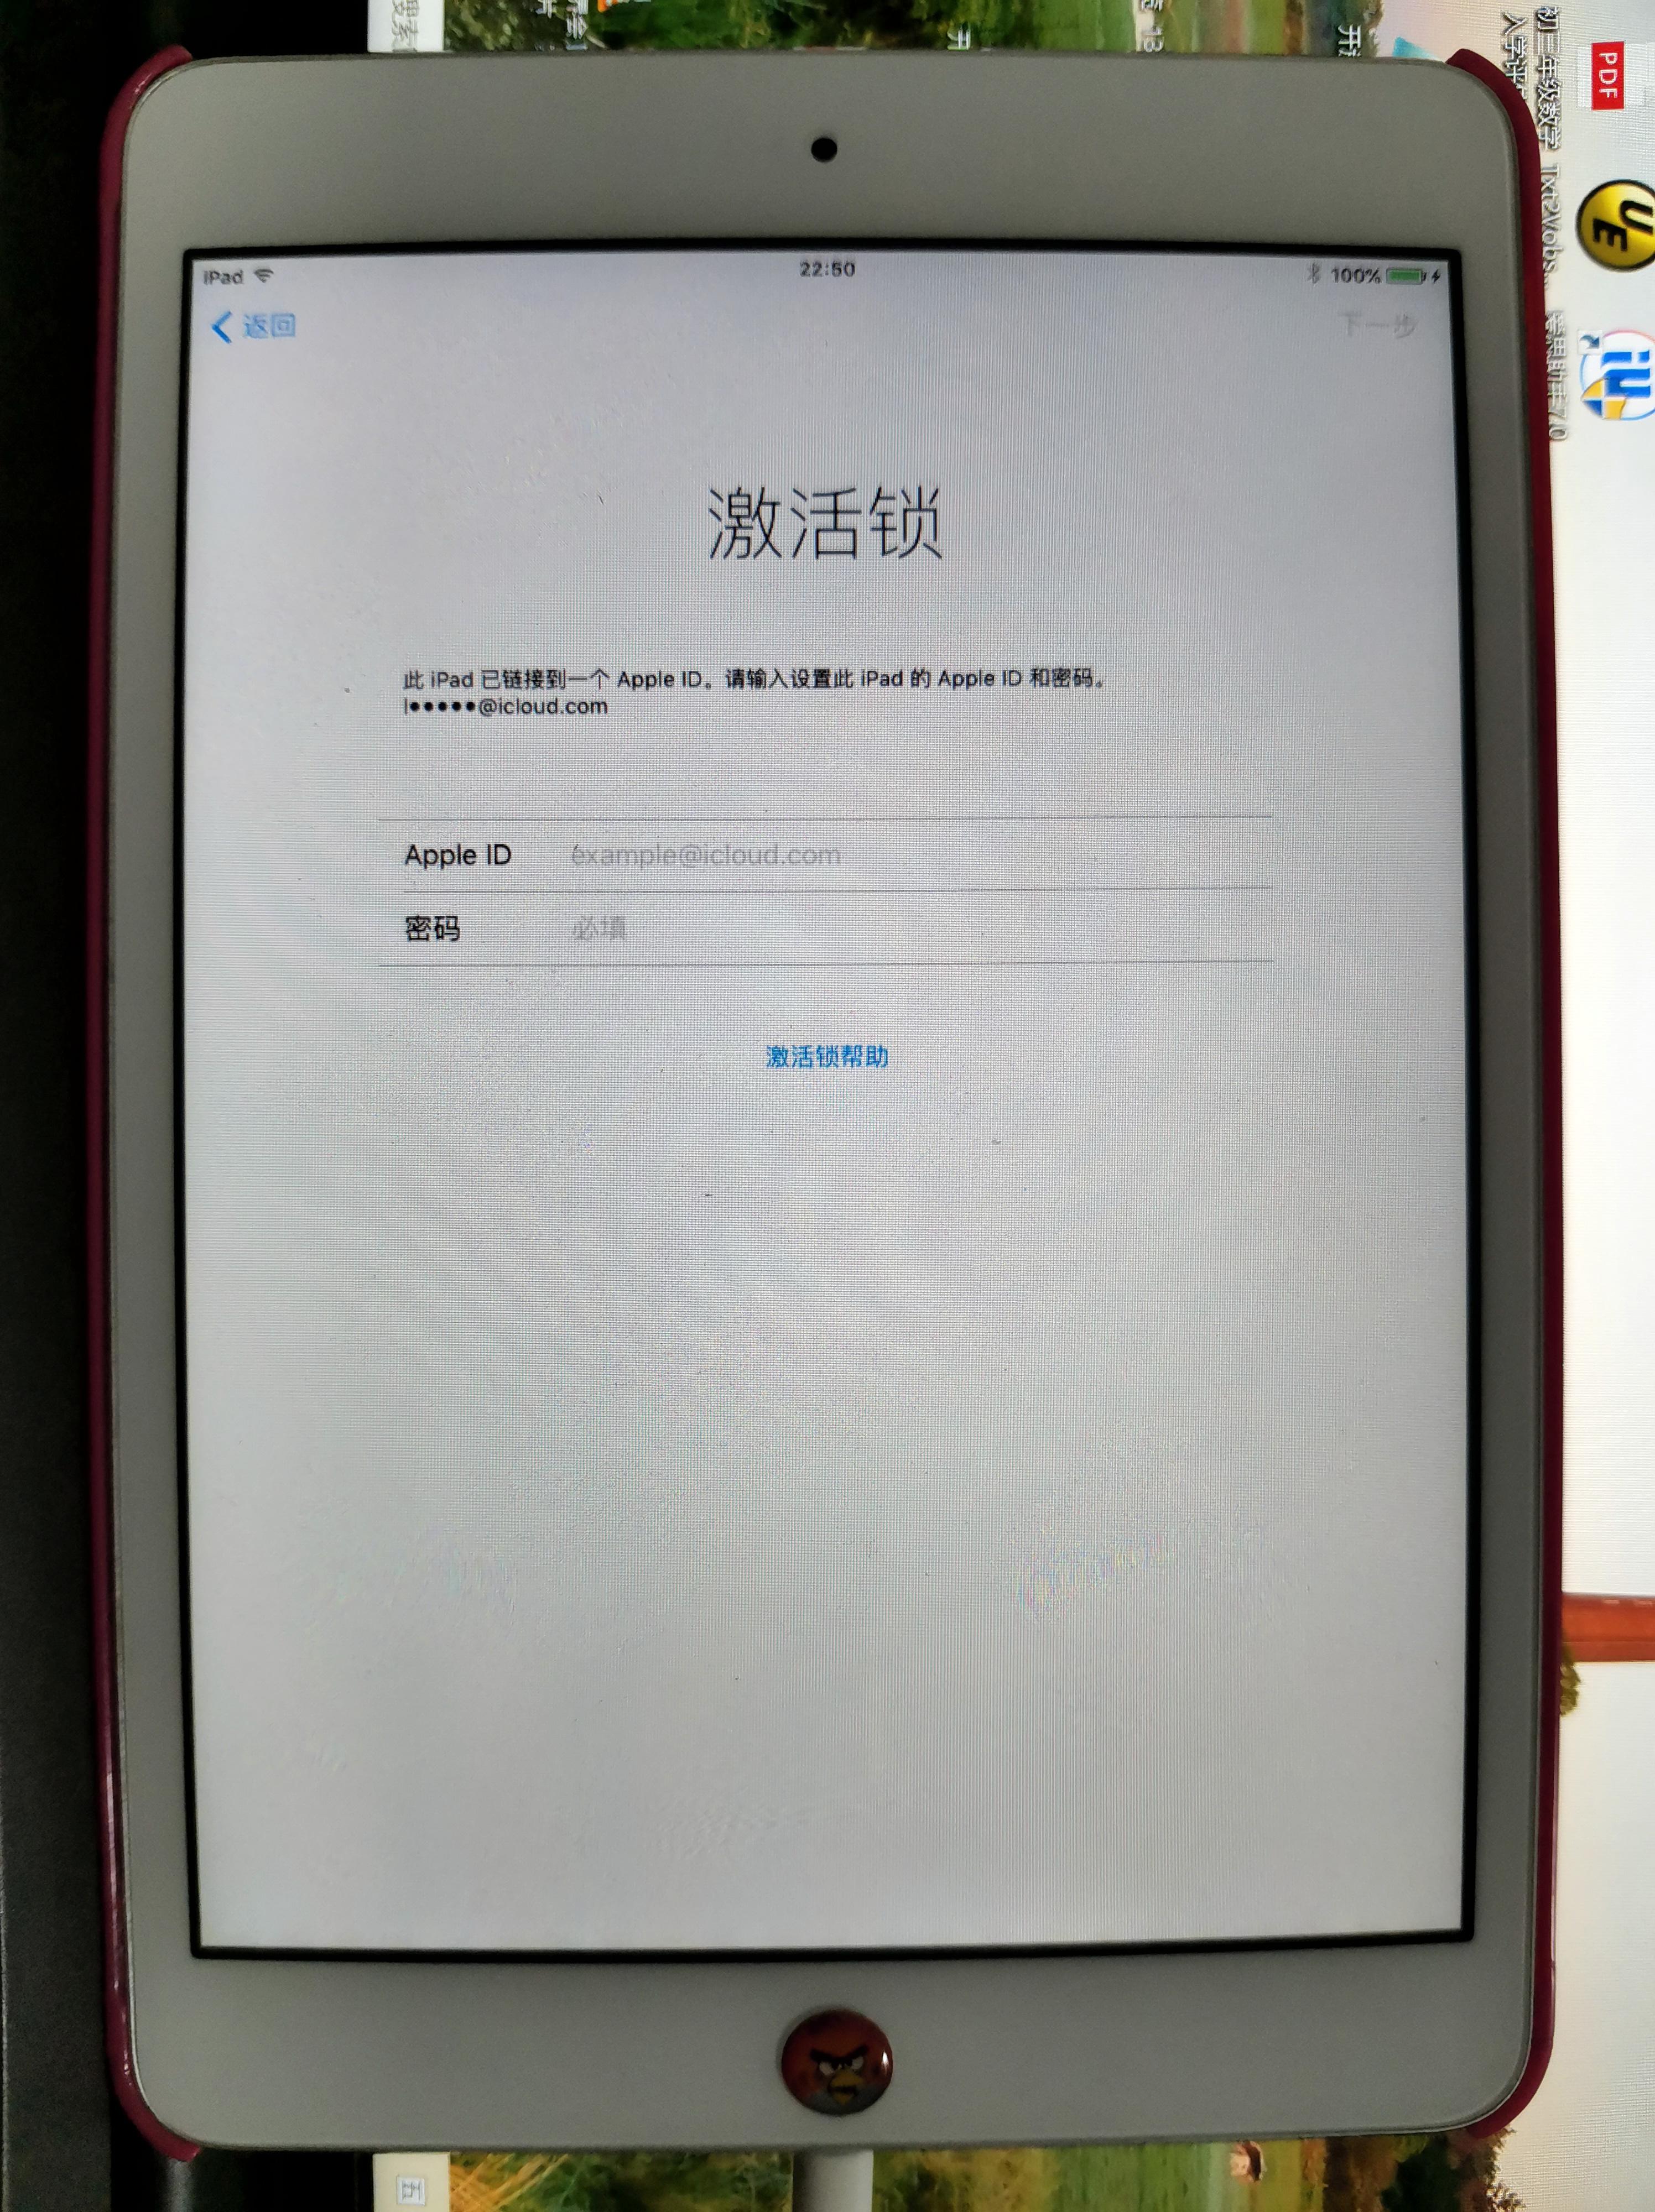 a1432是mini几代(苹果a1432回收价)